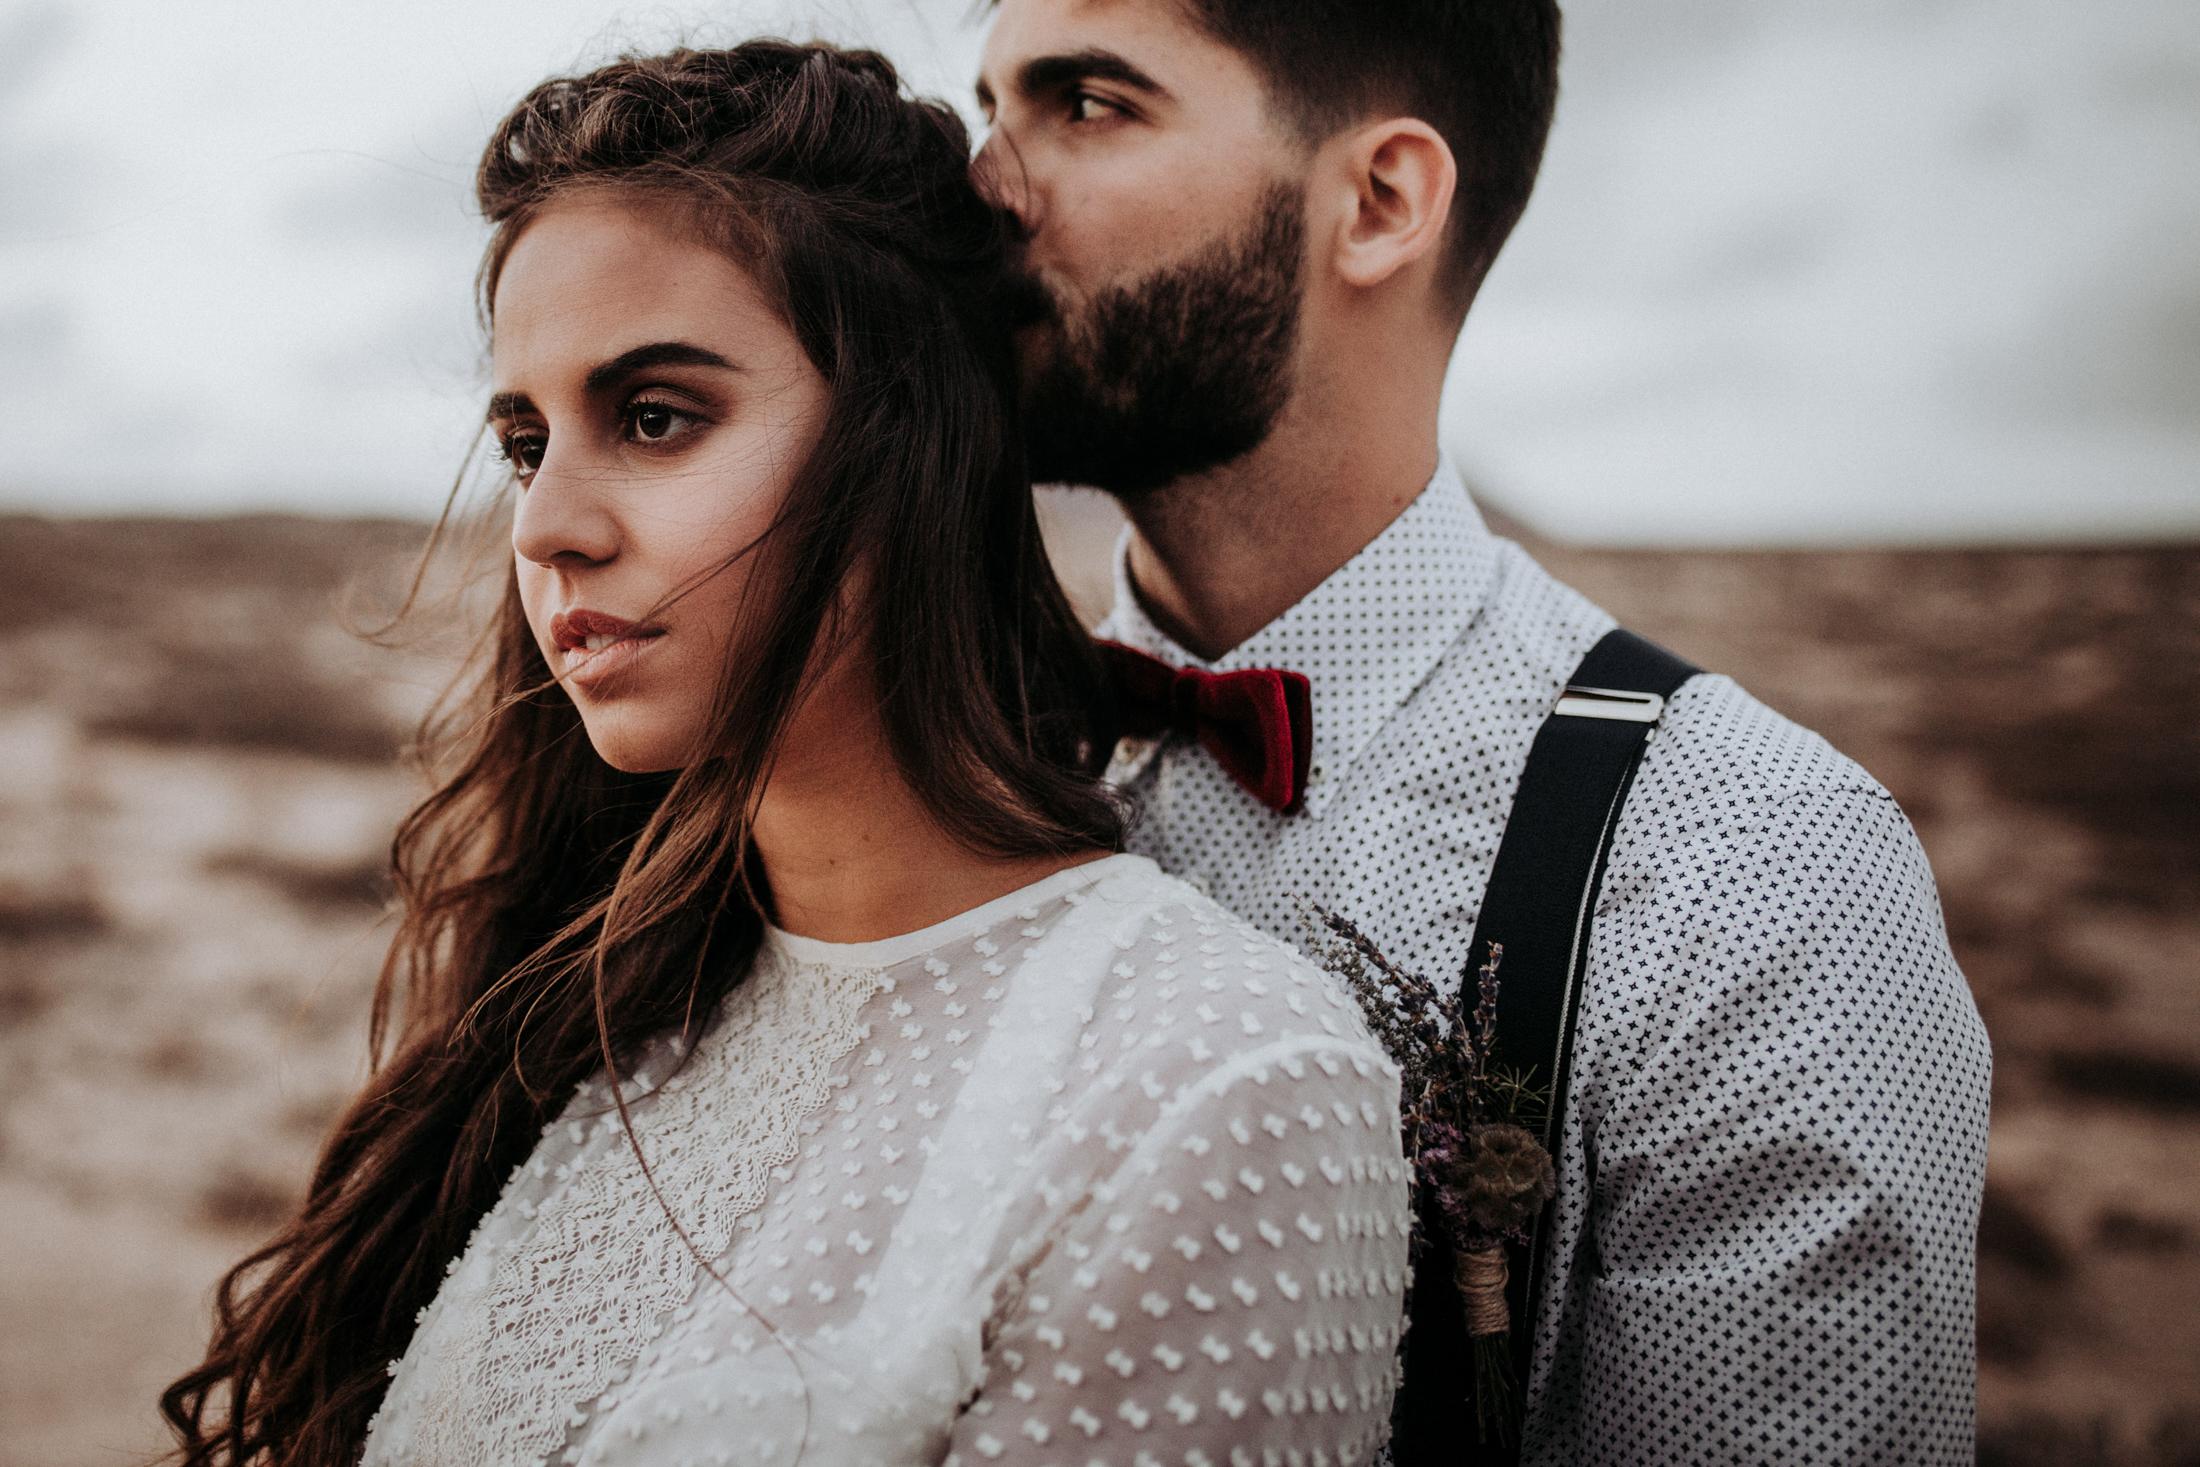 Wedding_Photographer_Mallorca_Daniela-Marquardt_Photography_CanaryIslands_Lanzarote_Iceland_Tuskany_Santorini_Portugal_Schweiz_Austria_Bayern_Elopement_Hochzeitsfotograf_37